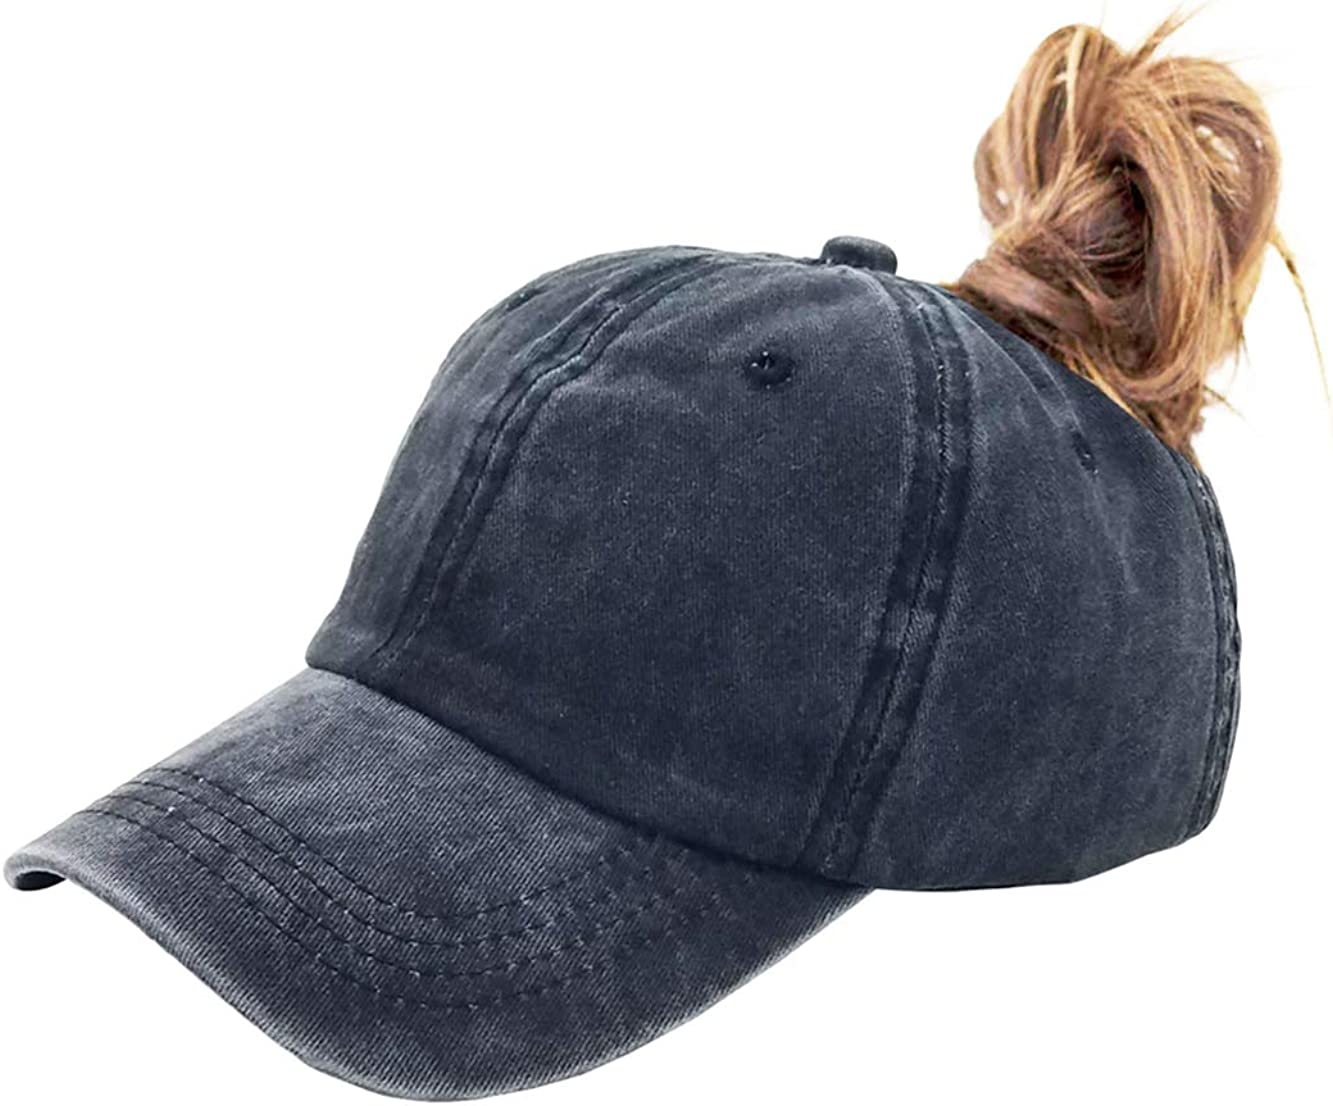 Eohak Ponytail Baseball Hat Distressed Retro Washed Womens Twill